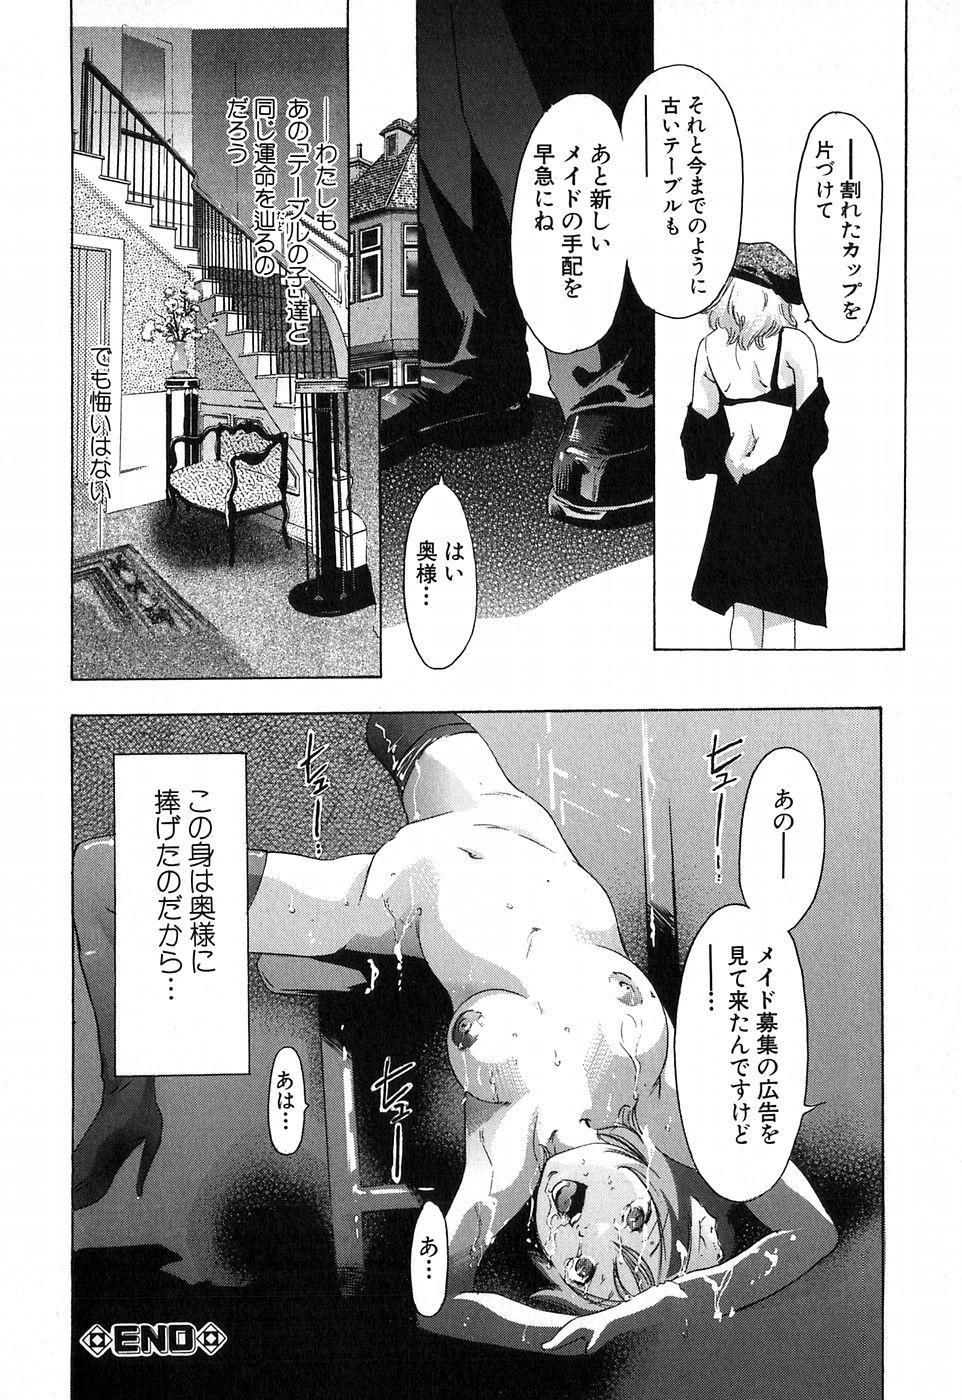 Uchi Naru Koe - Voice which becomes inside 69